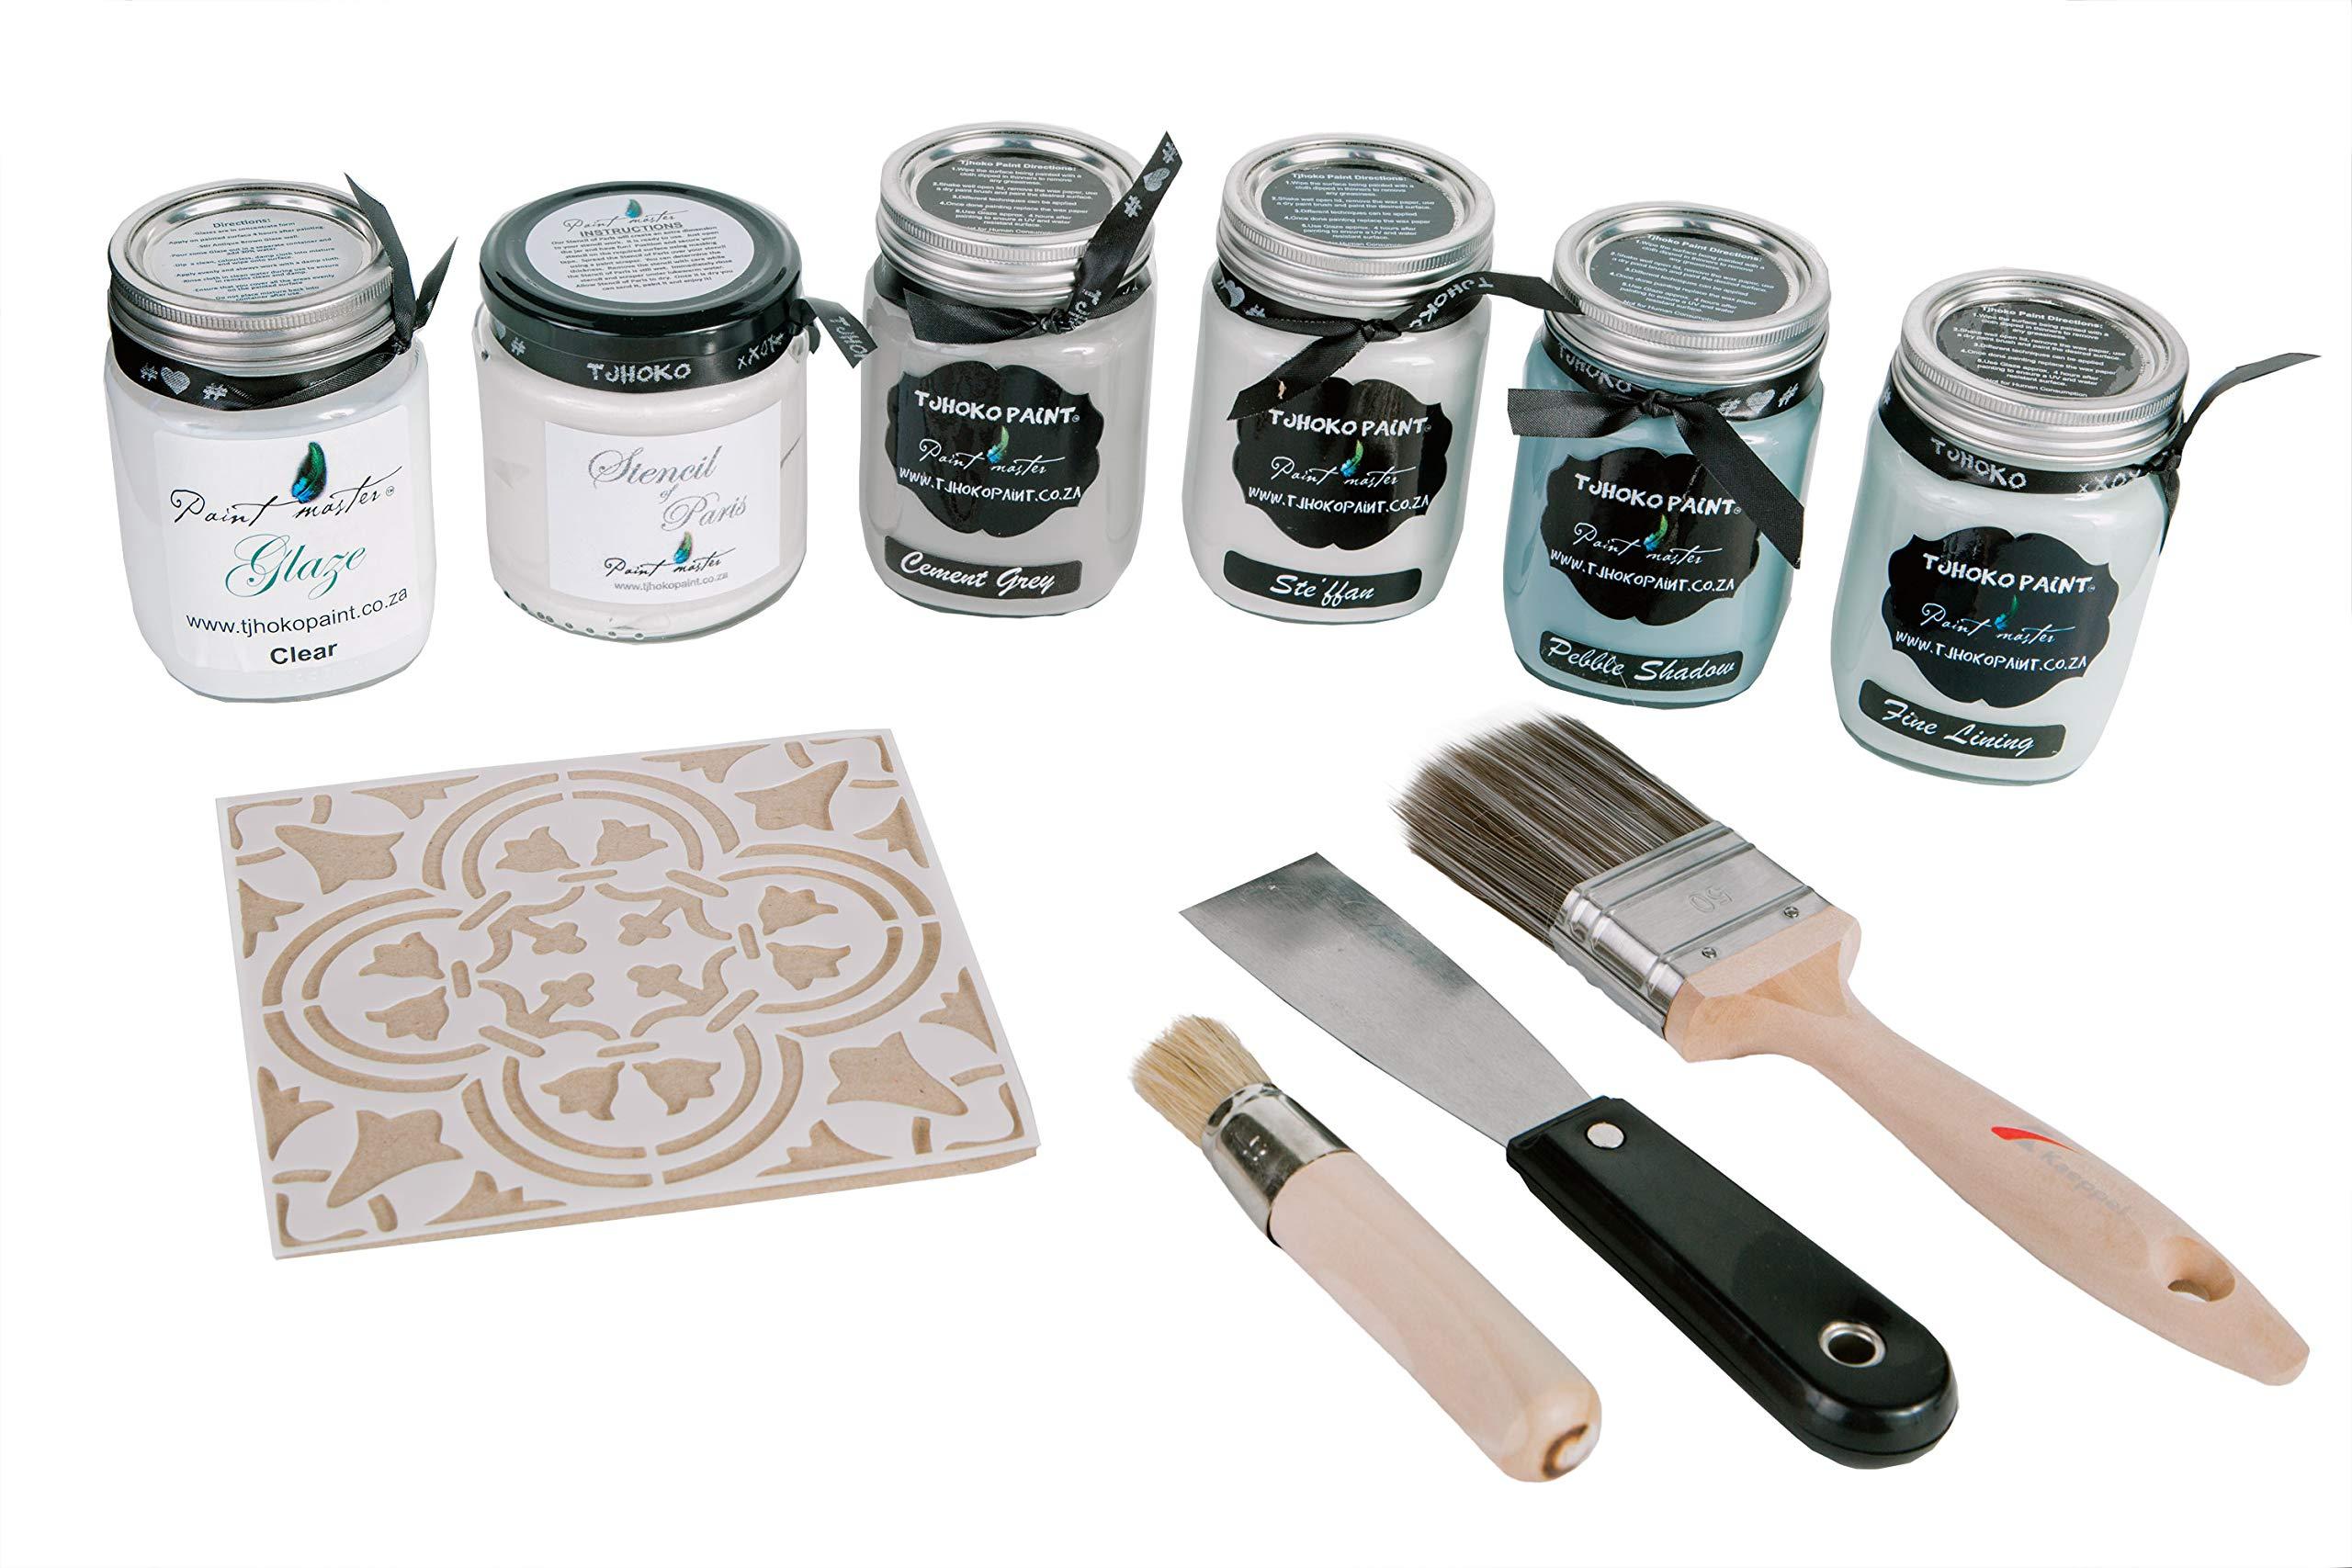 Tjhoko Paint's Deco Art Chalk Paint Kit - No Voc Paint for Chalk Couture & DIY Indoor & Outdoor Furniture (Cement Grey)